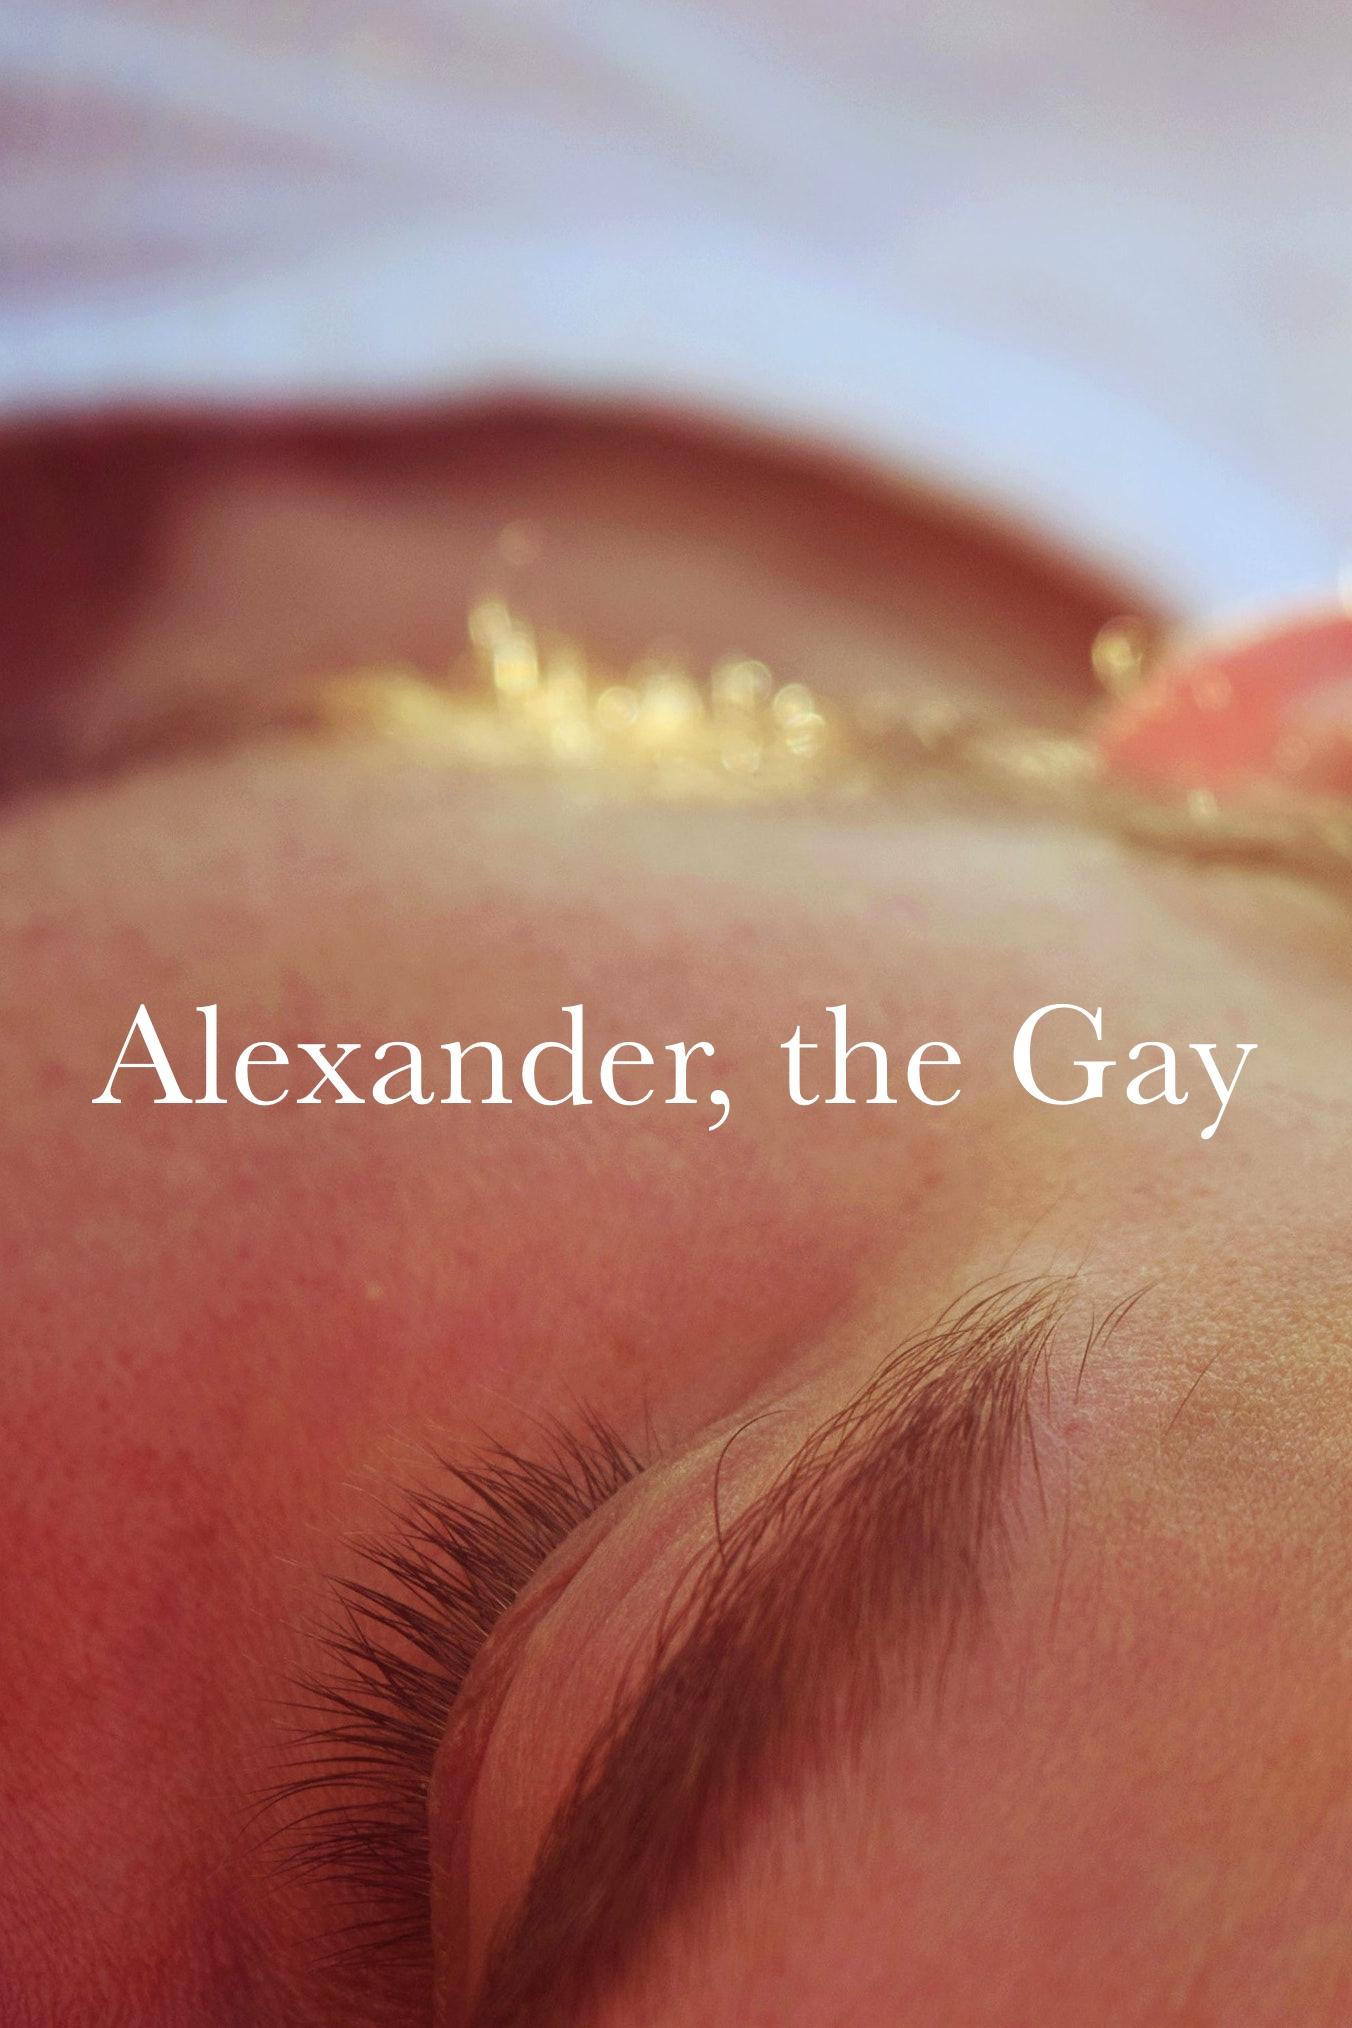 Alexander the Gay film script